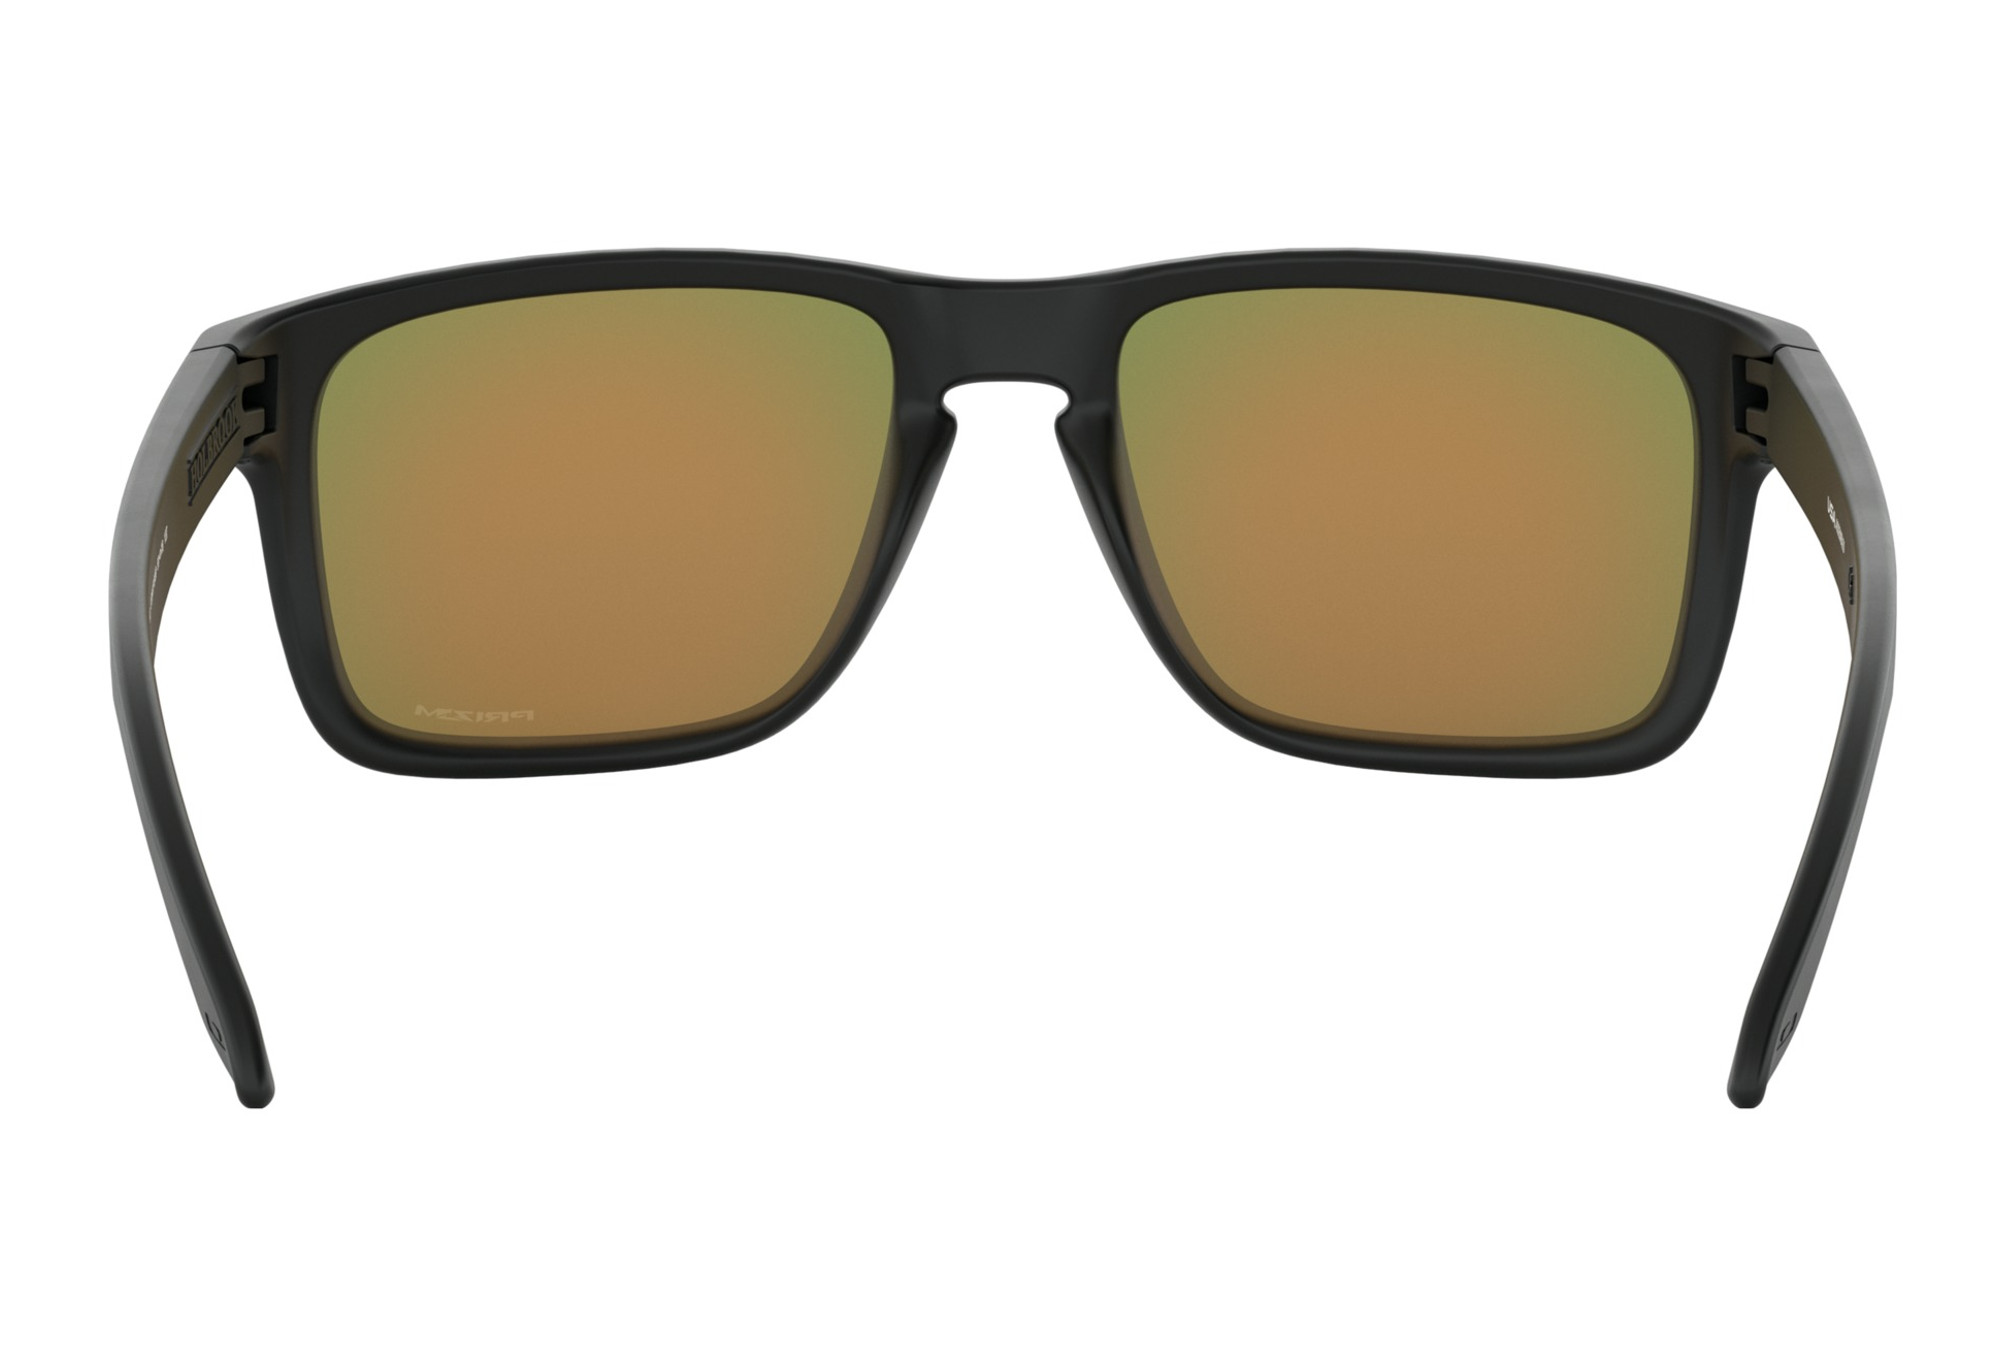 2d4cae1d81 Oakley Holbrook XL Sunglasses Black - Prizm Ruby OO9417-0459 ...